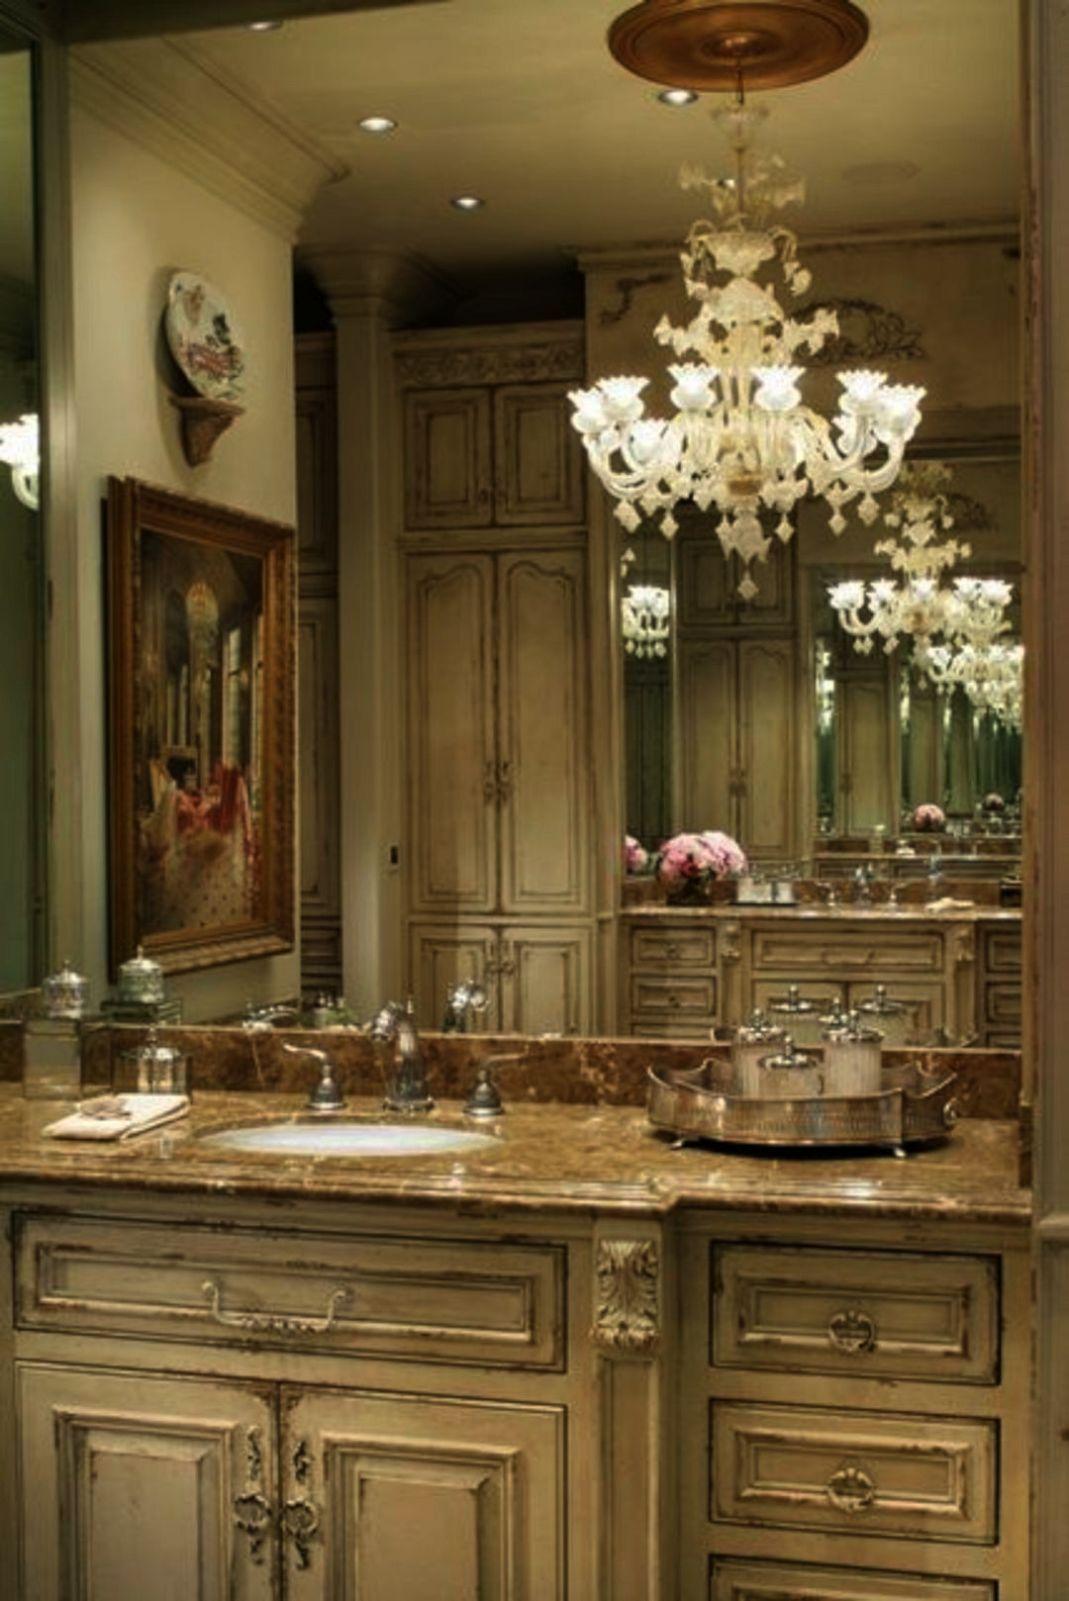 Luxury Bathrooms Images Most Elegant Bathrooms In The ...